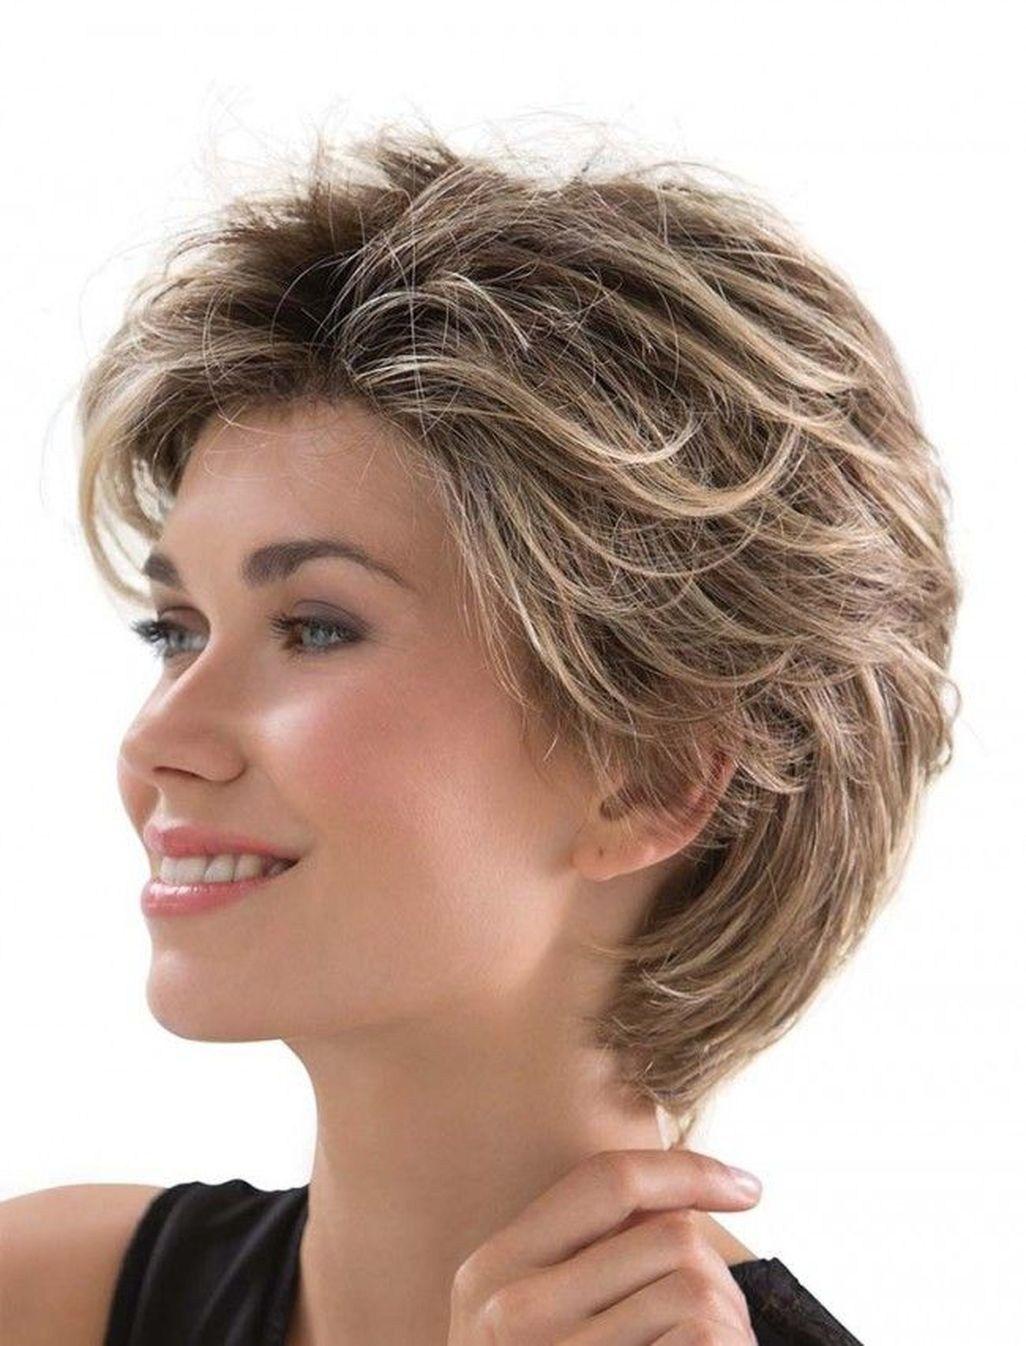 Gorgeous Short Hairstyles Ideas For Women 11   Short shag ...